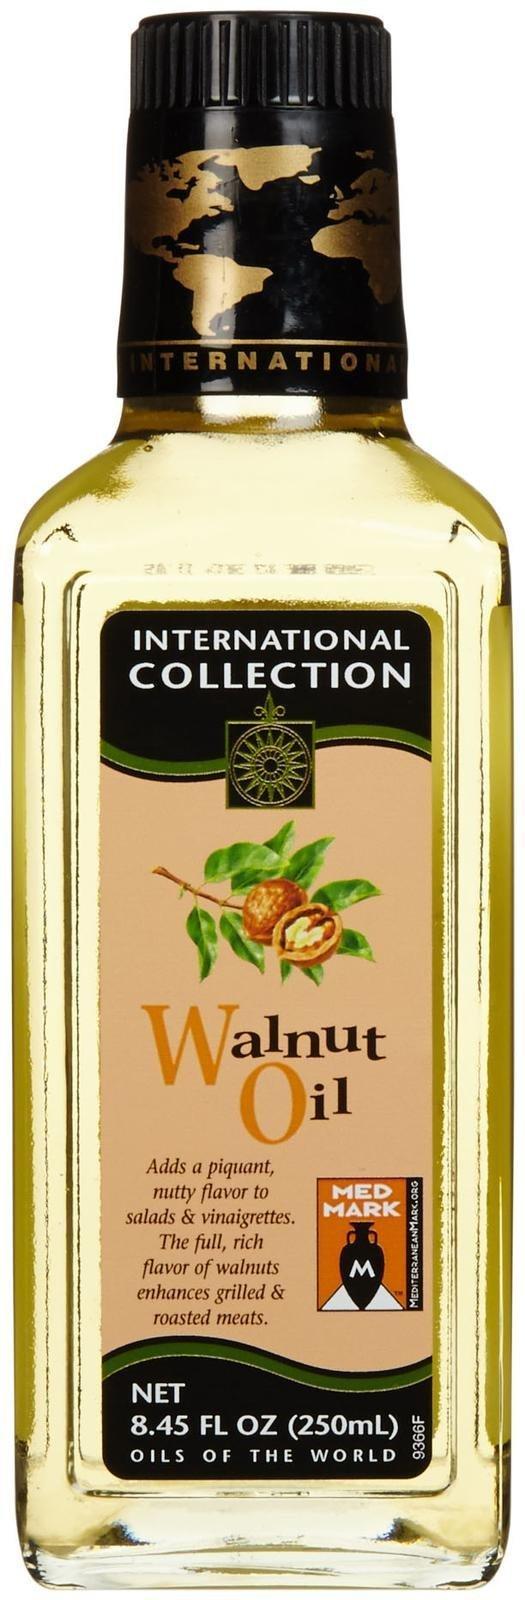 International Collection Walnut Oil - 8.45 Ounces